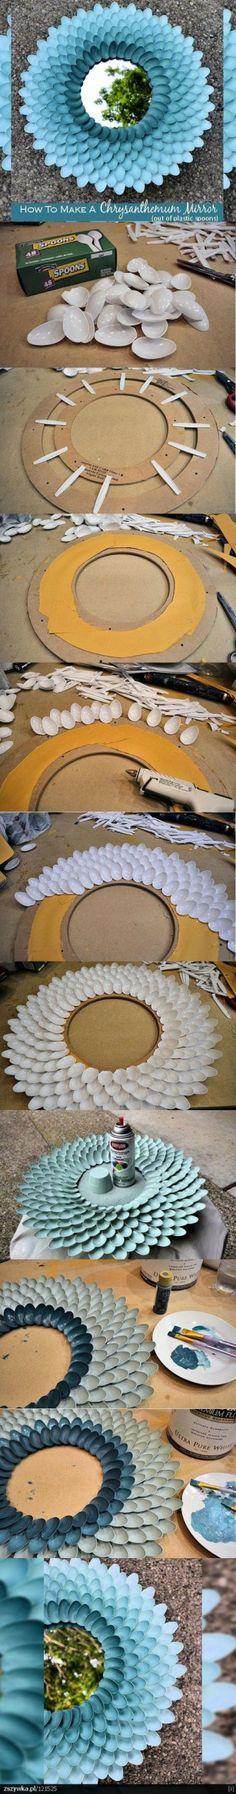 Ronde spiegel pimpen met plastic lepeltjes!